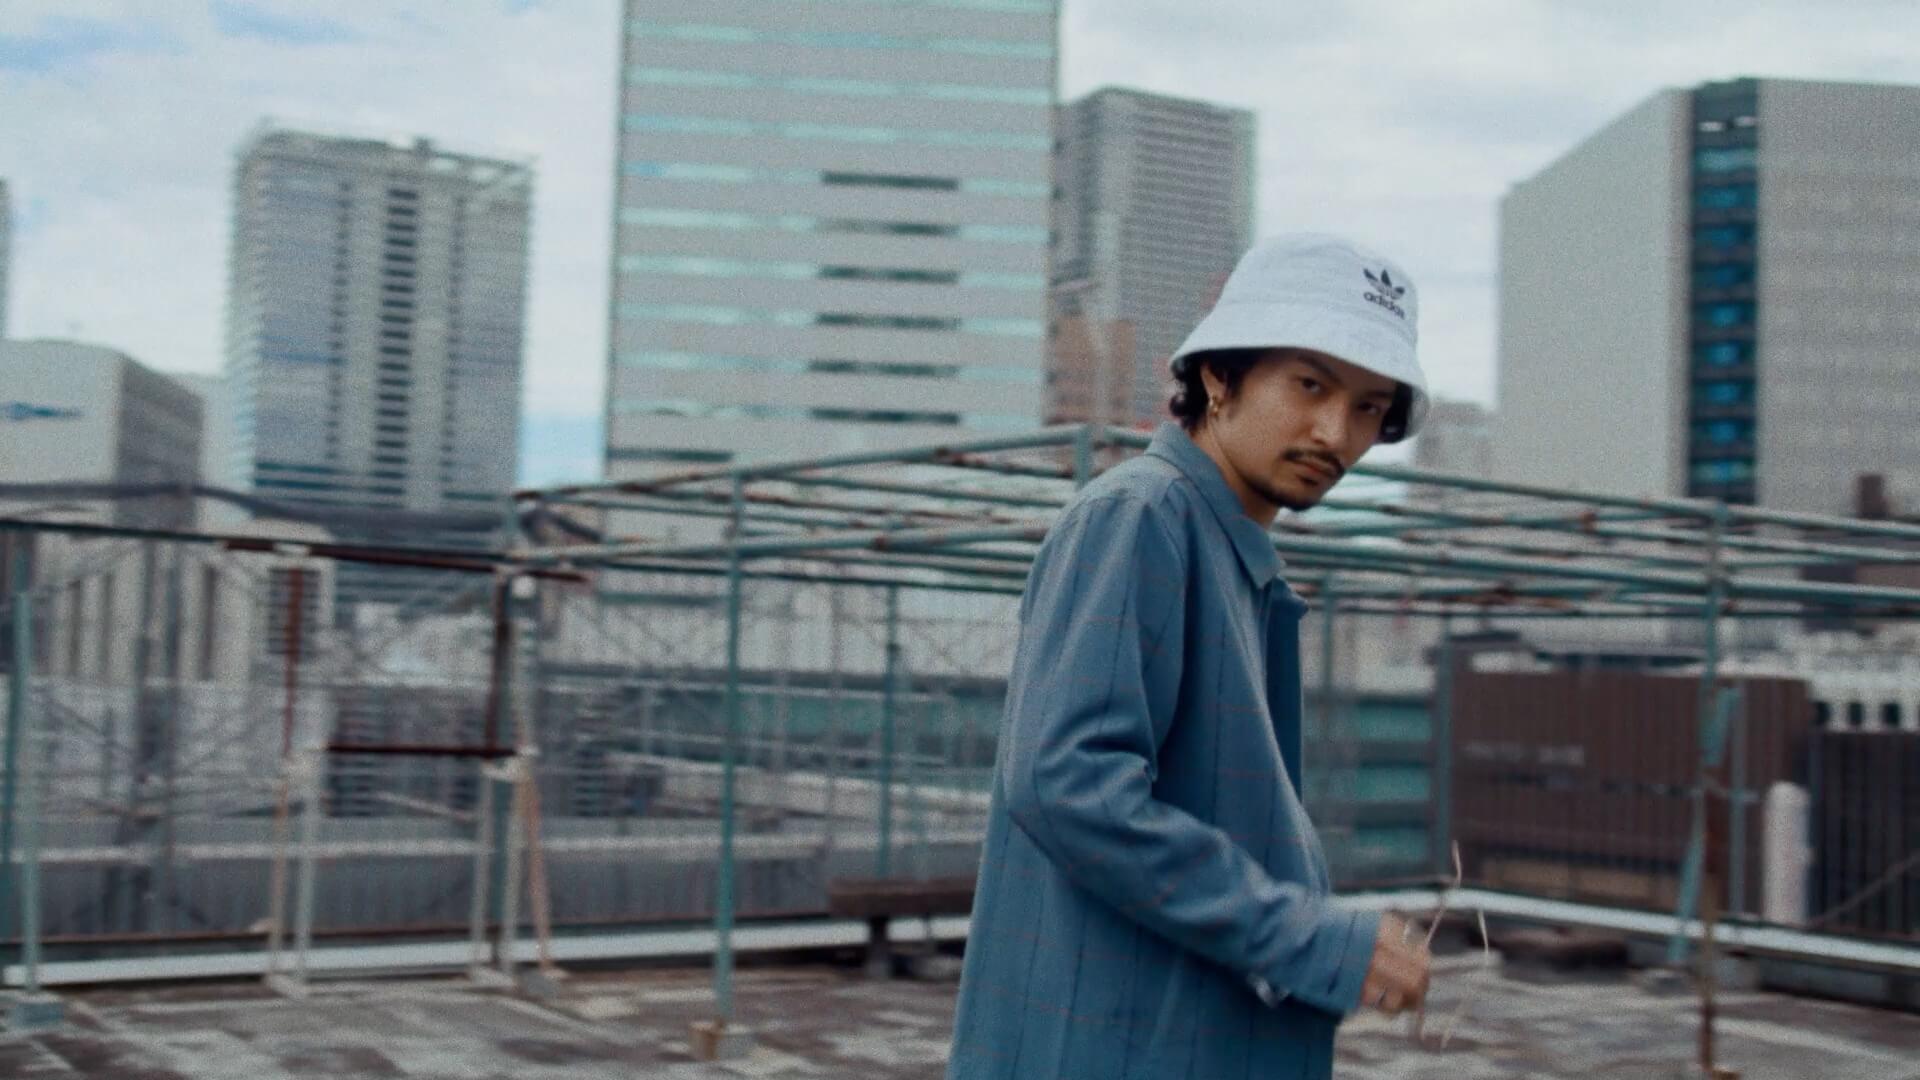 adidas Originals『FORUM』のプロモーションフィルムが公開!King Gnu常田大希が出演 life210716_adidasoriginals_forum_10